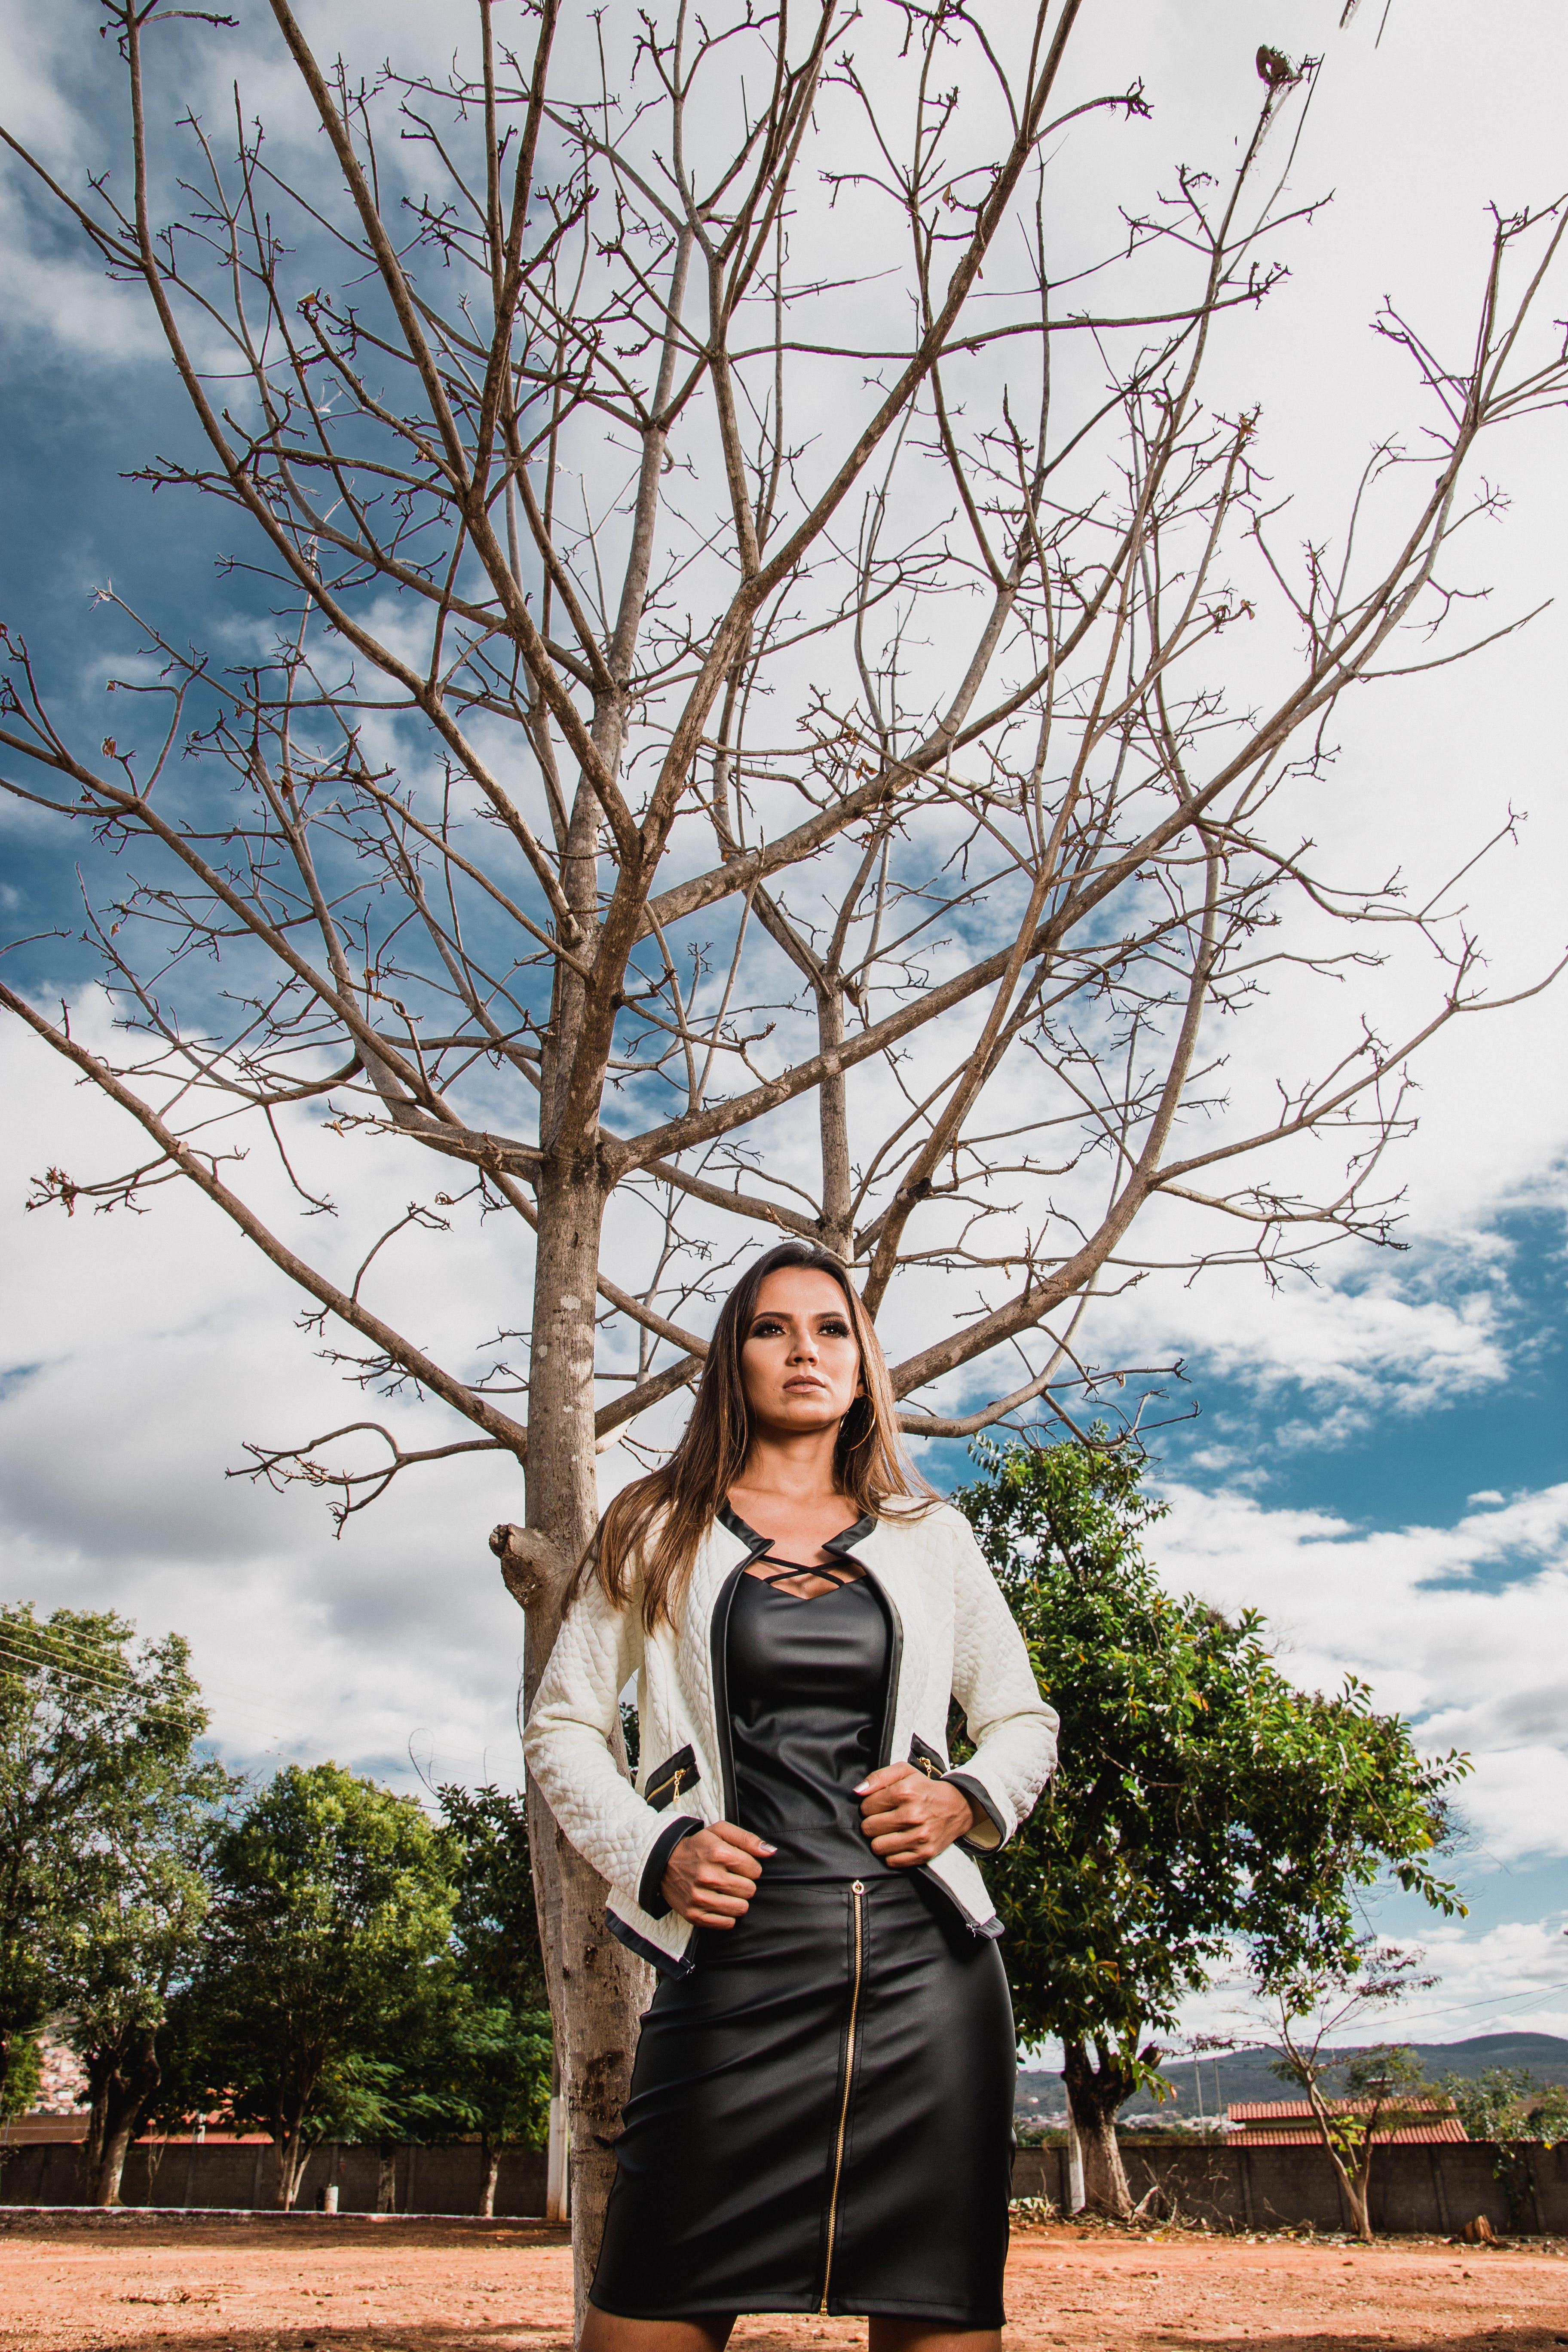 Photo Of Woman Standing Near Tree